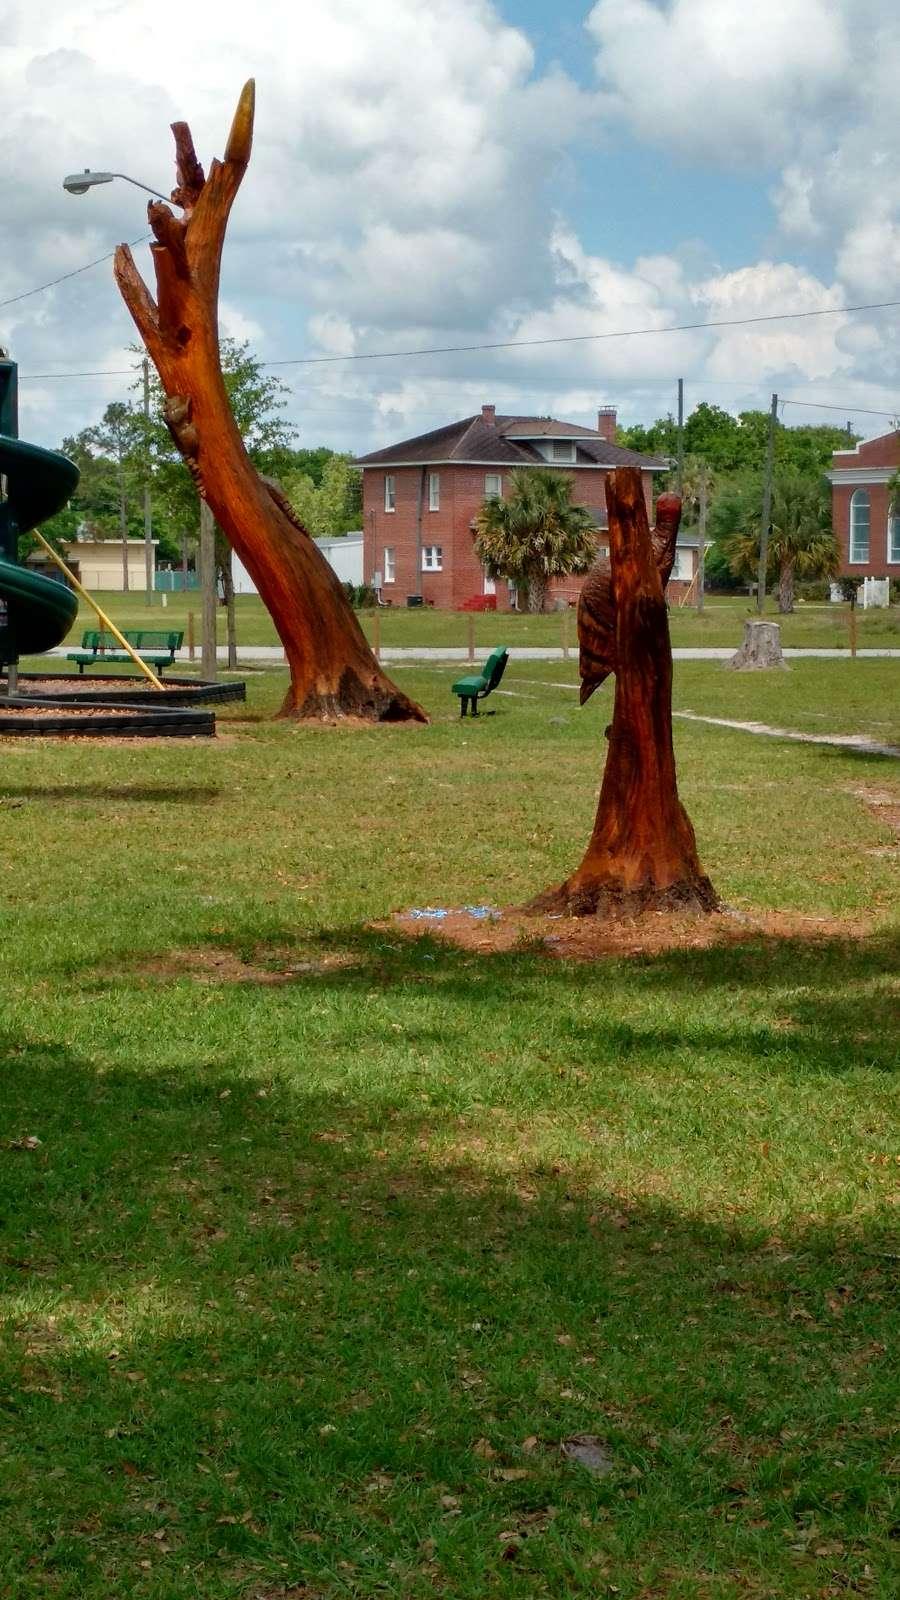 Cadwell Park - park  | Photo 4 of 10 | Address: 1 Cassady St, Umatilla, FL 32784, USA